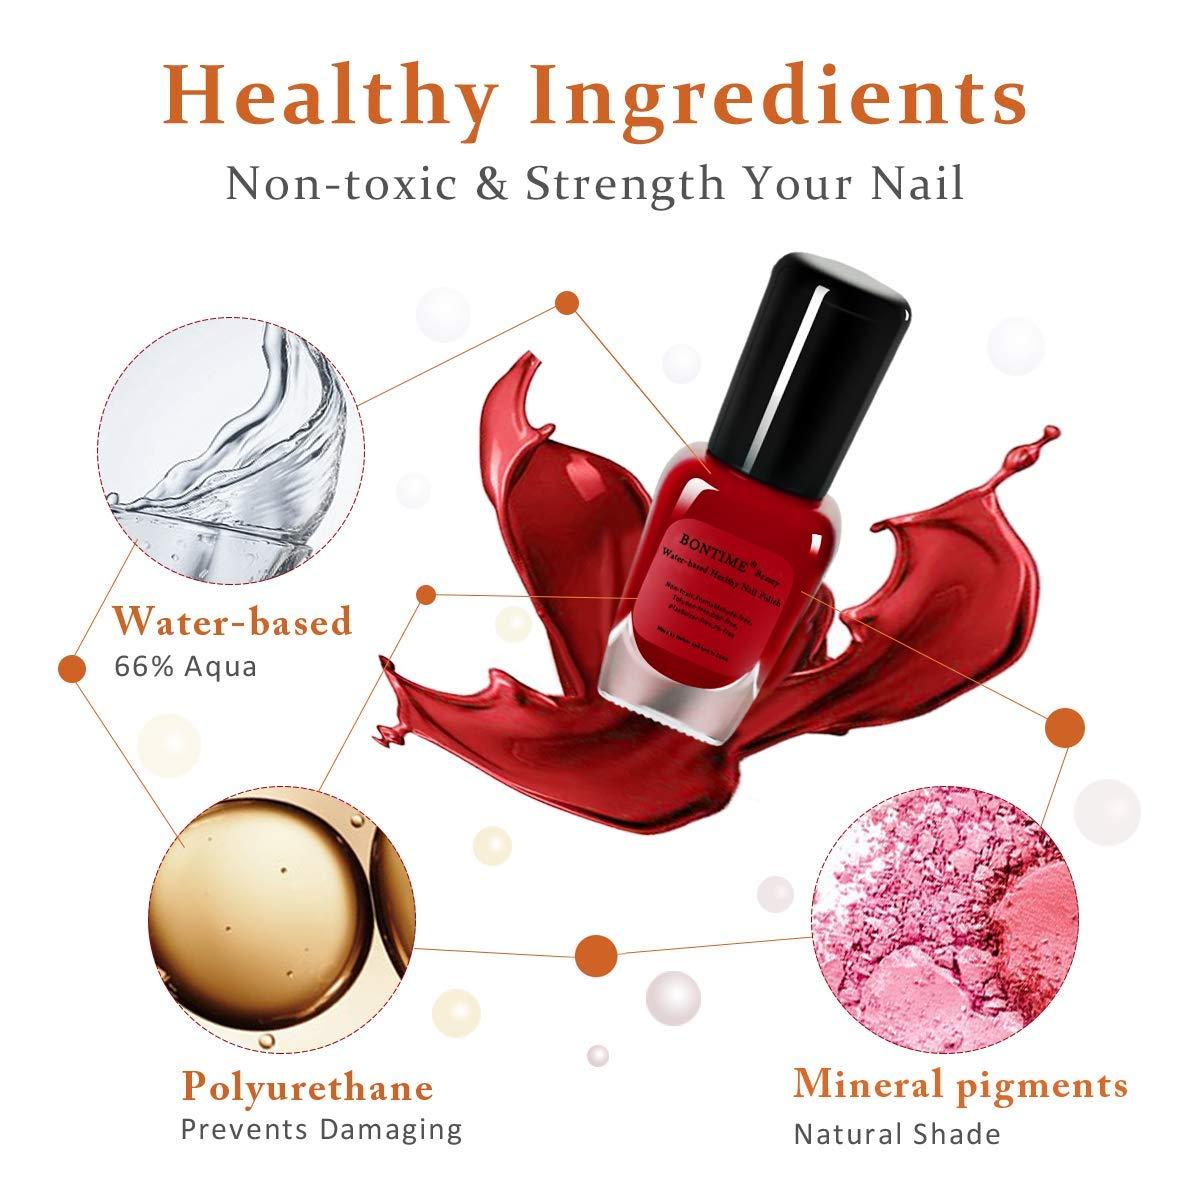 BONTIME Non-Toxic Nail Polish - Easy Peel Off & Quick Dry, Organic Water Based Nail Polish Set for Women,Teens,Kids(6 Colors,0.28 fl oz)